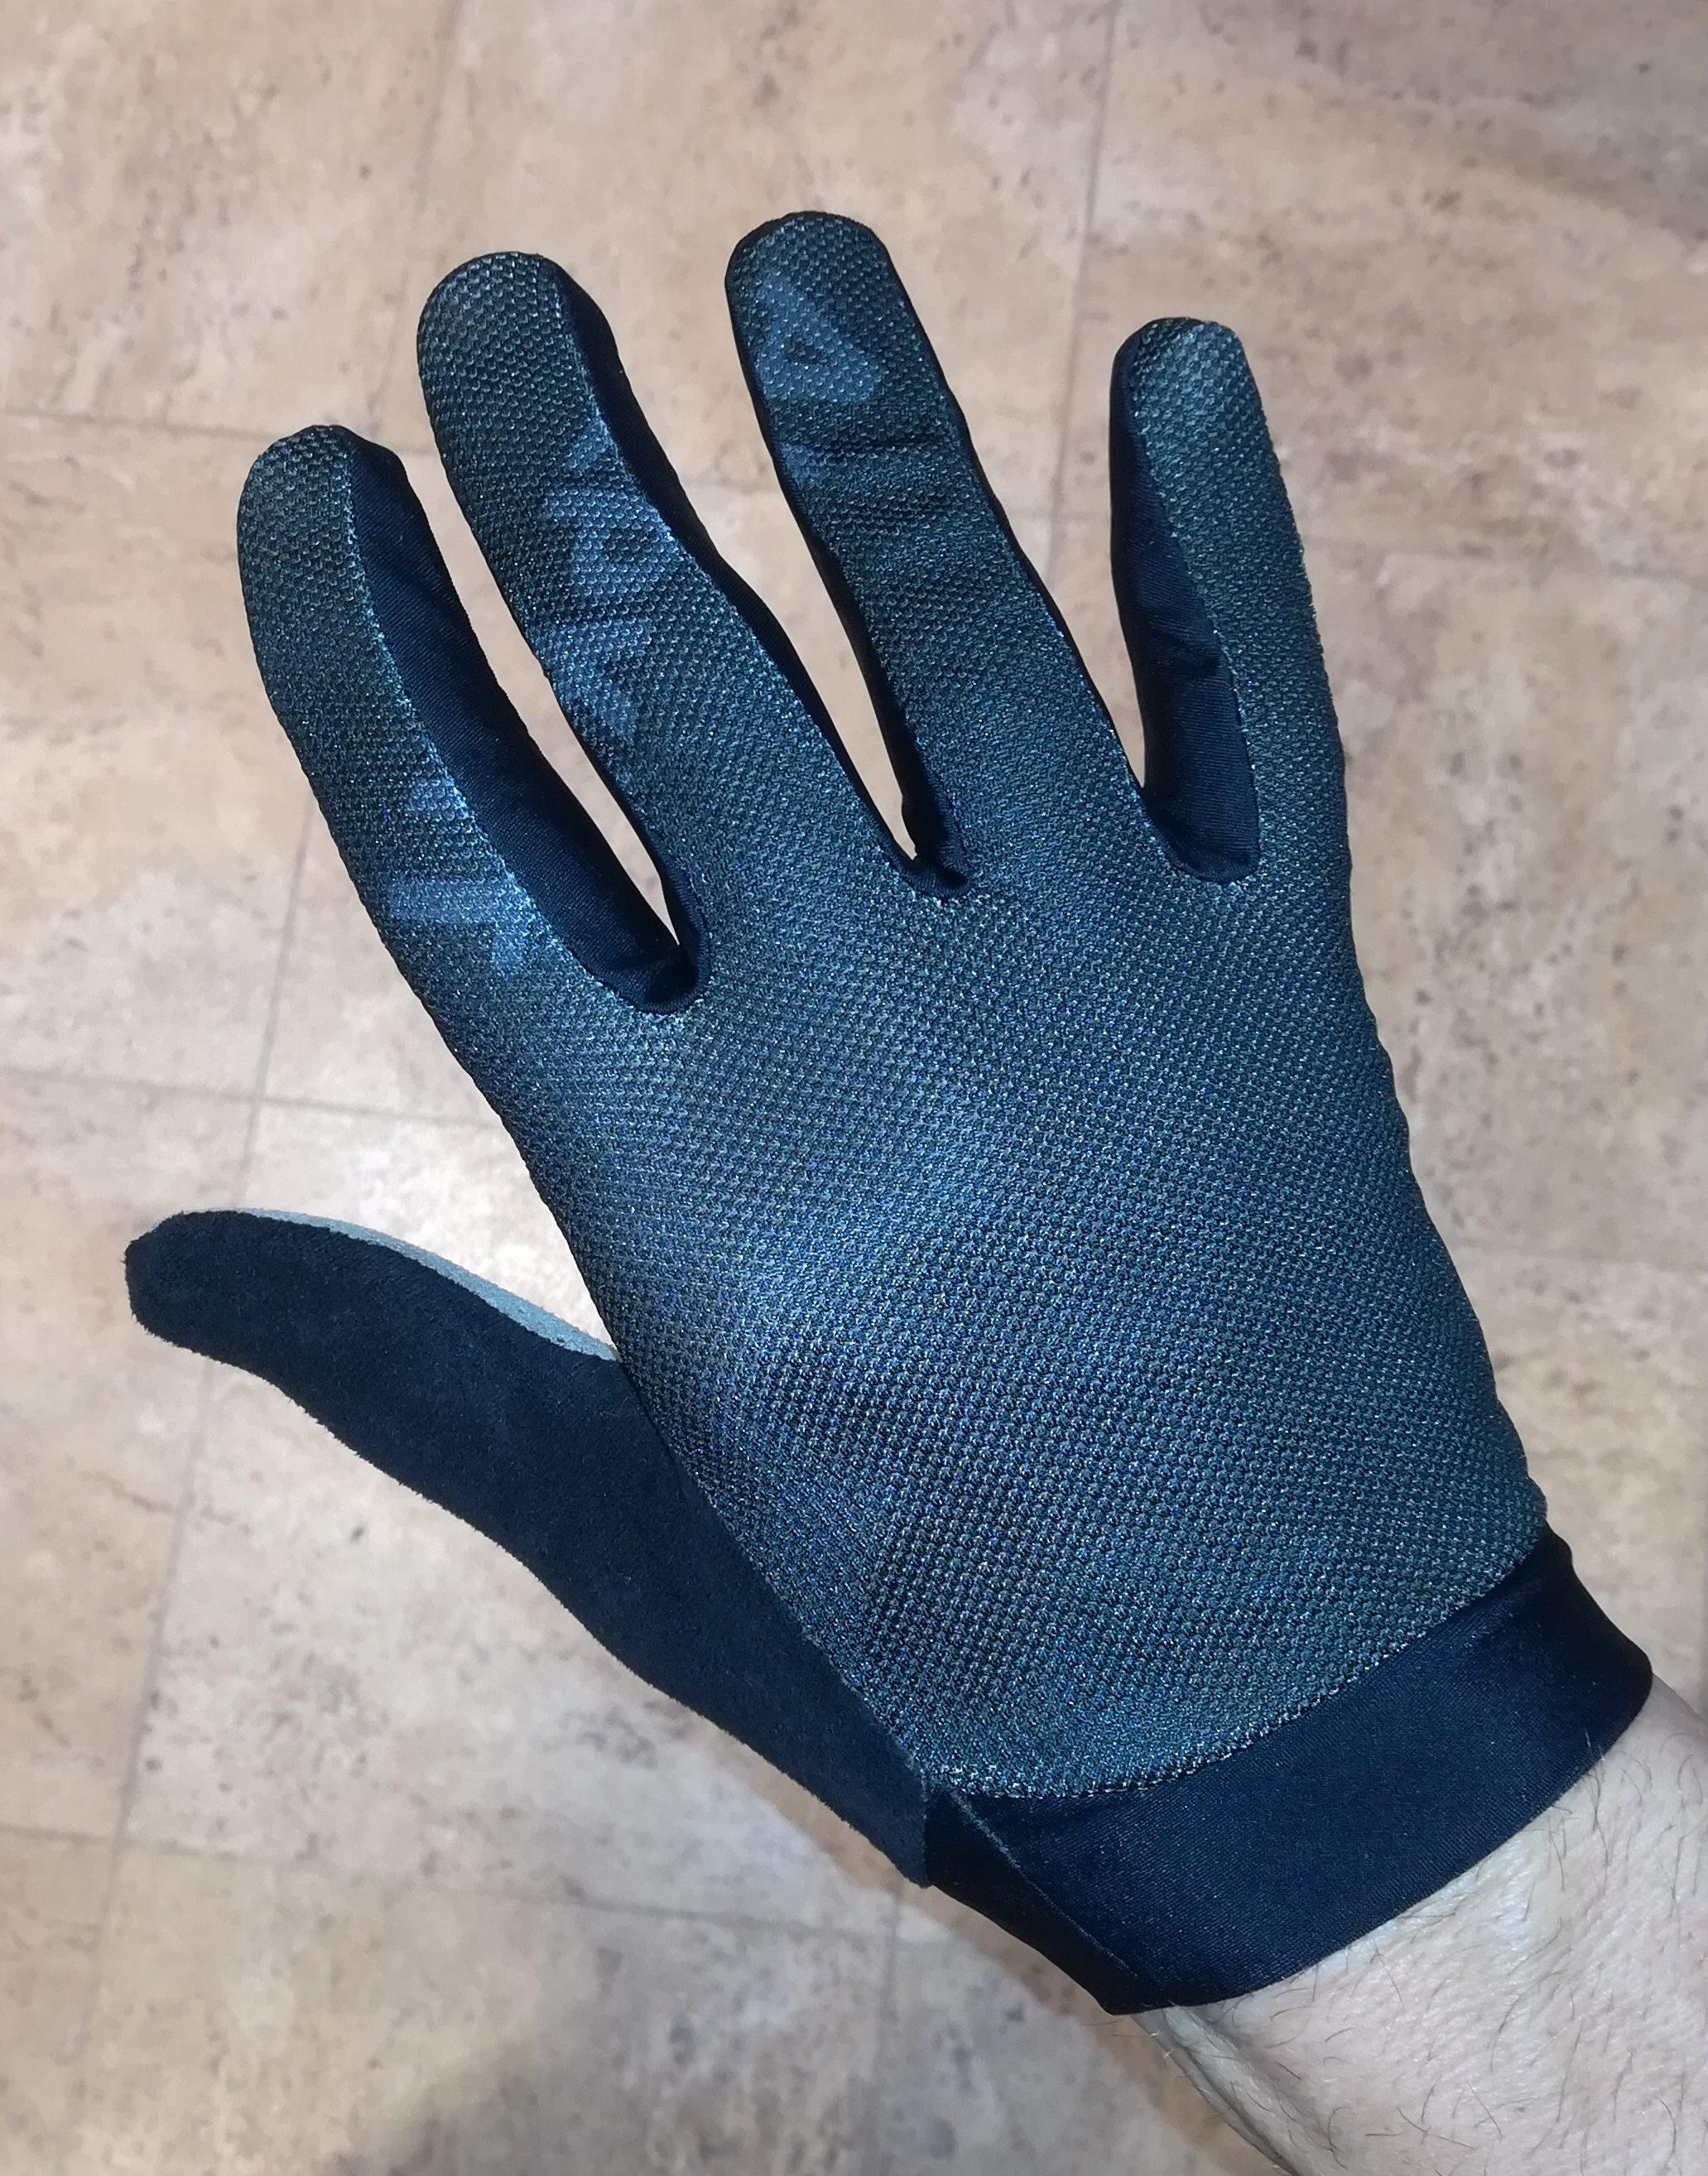 Alpkit Comet Glove